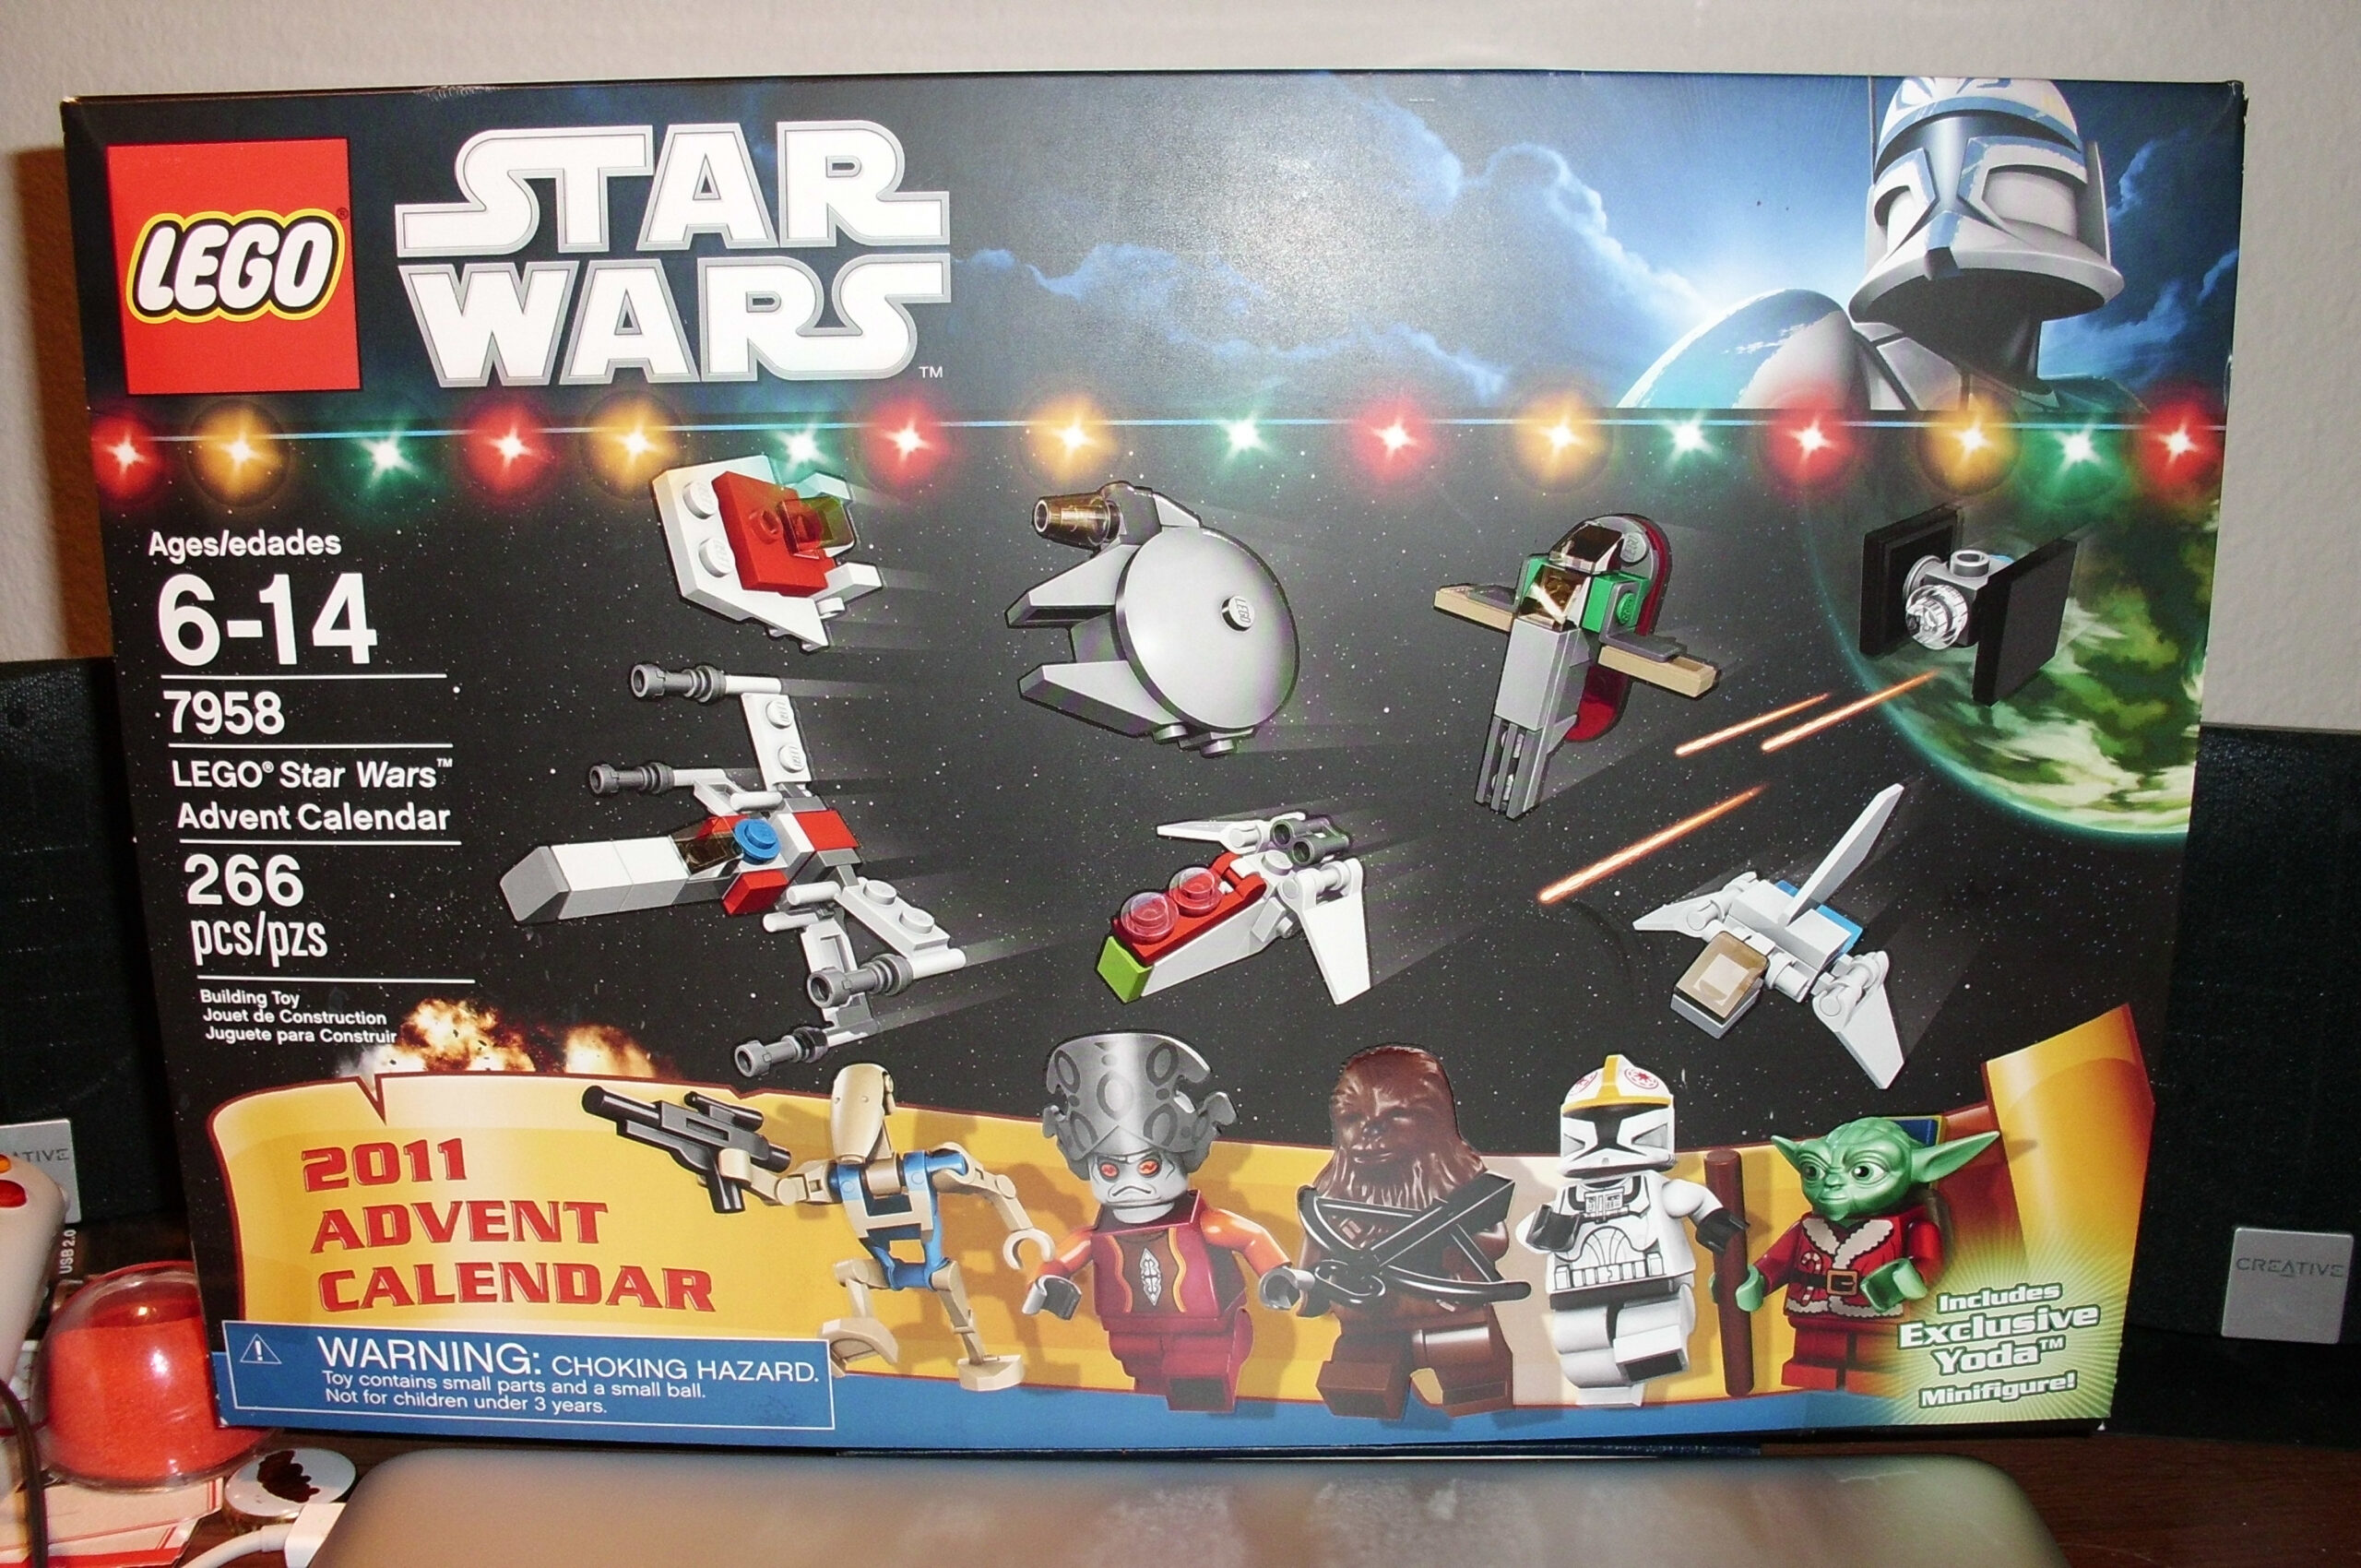 Star Wars Lego Advent Calendar, Day 1  Spencer Ex San Diego for Lego Star Wars Advent Calendar Instructions